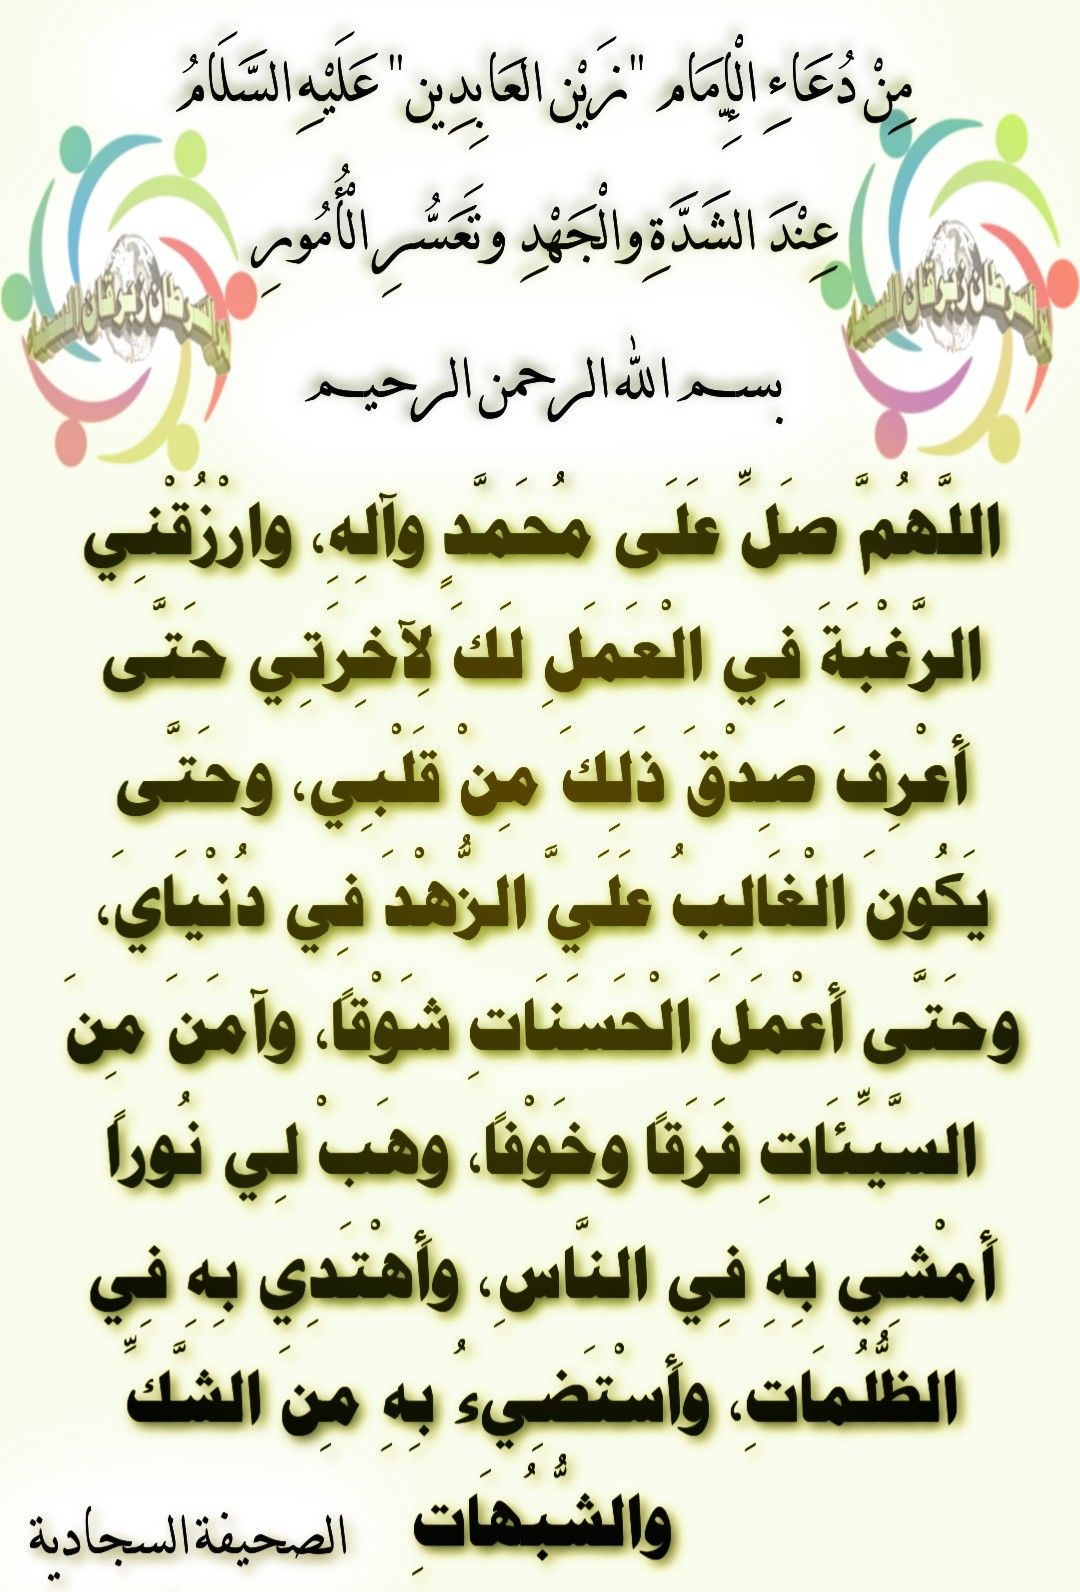 Pin By صياح الحمصي On الإمام علي زين العابدين عليه السلام Math Prayers Arabic Calligraphy